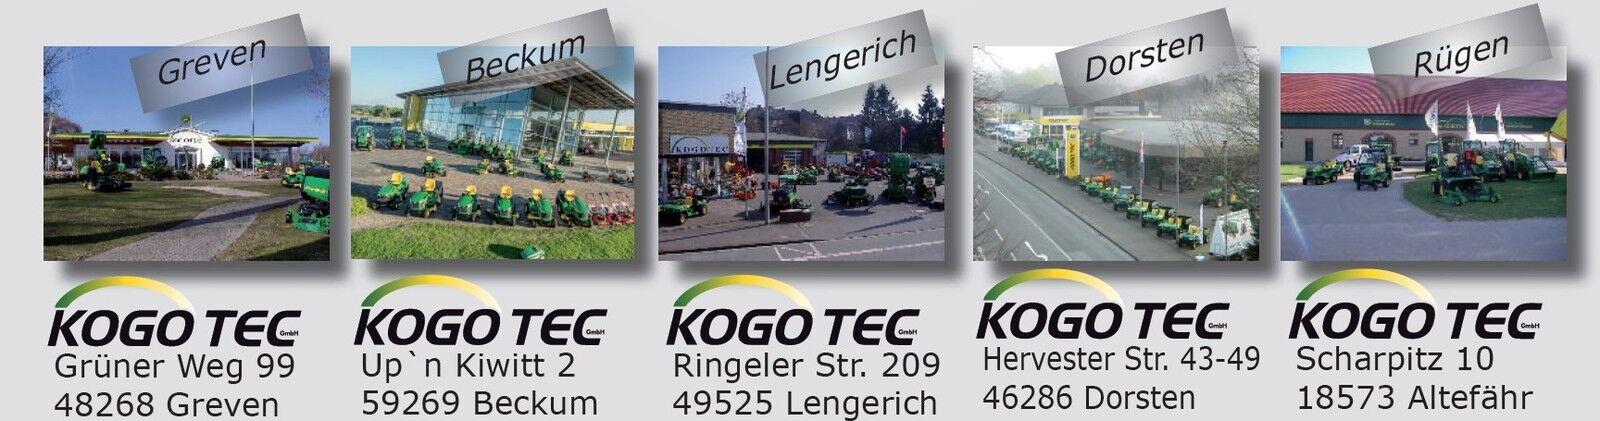 KOGOTEC_GmbH